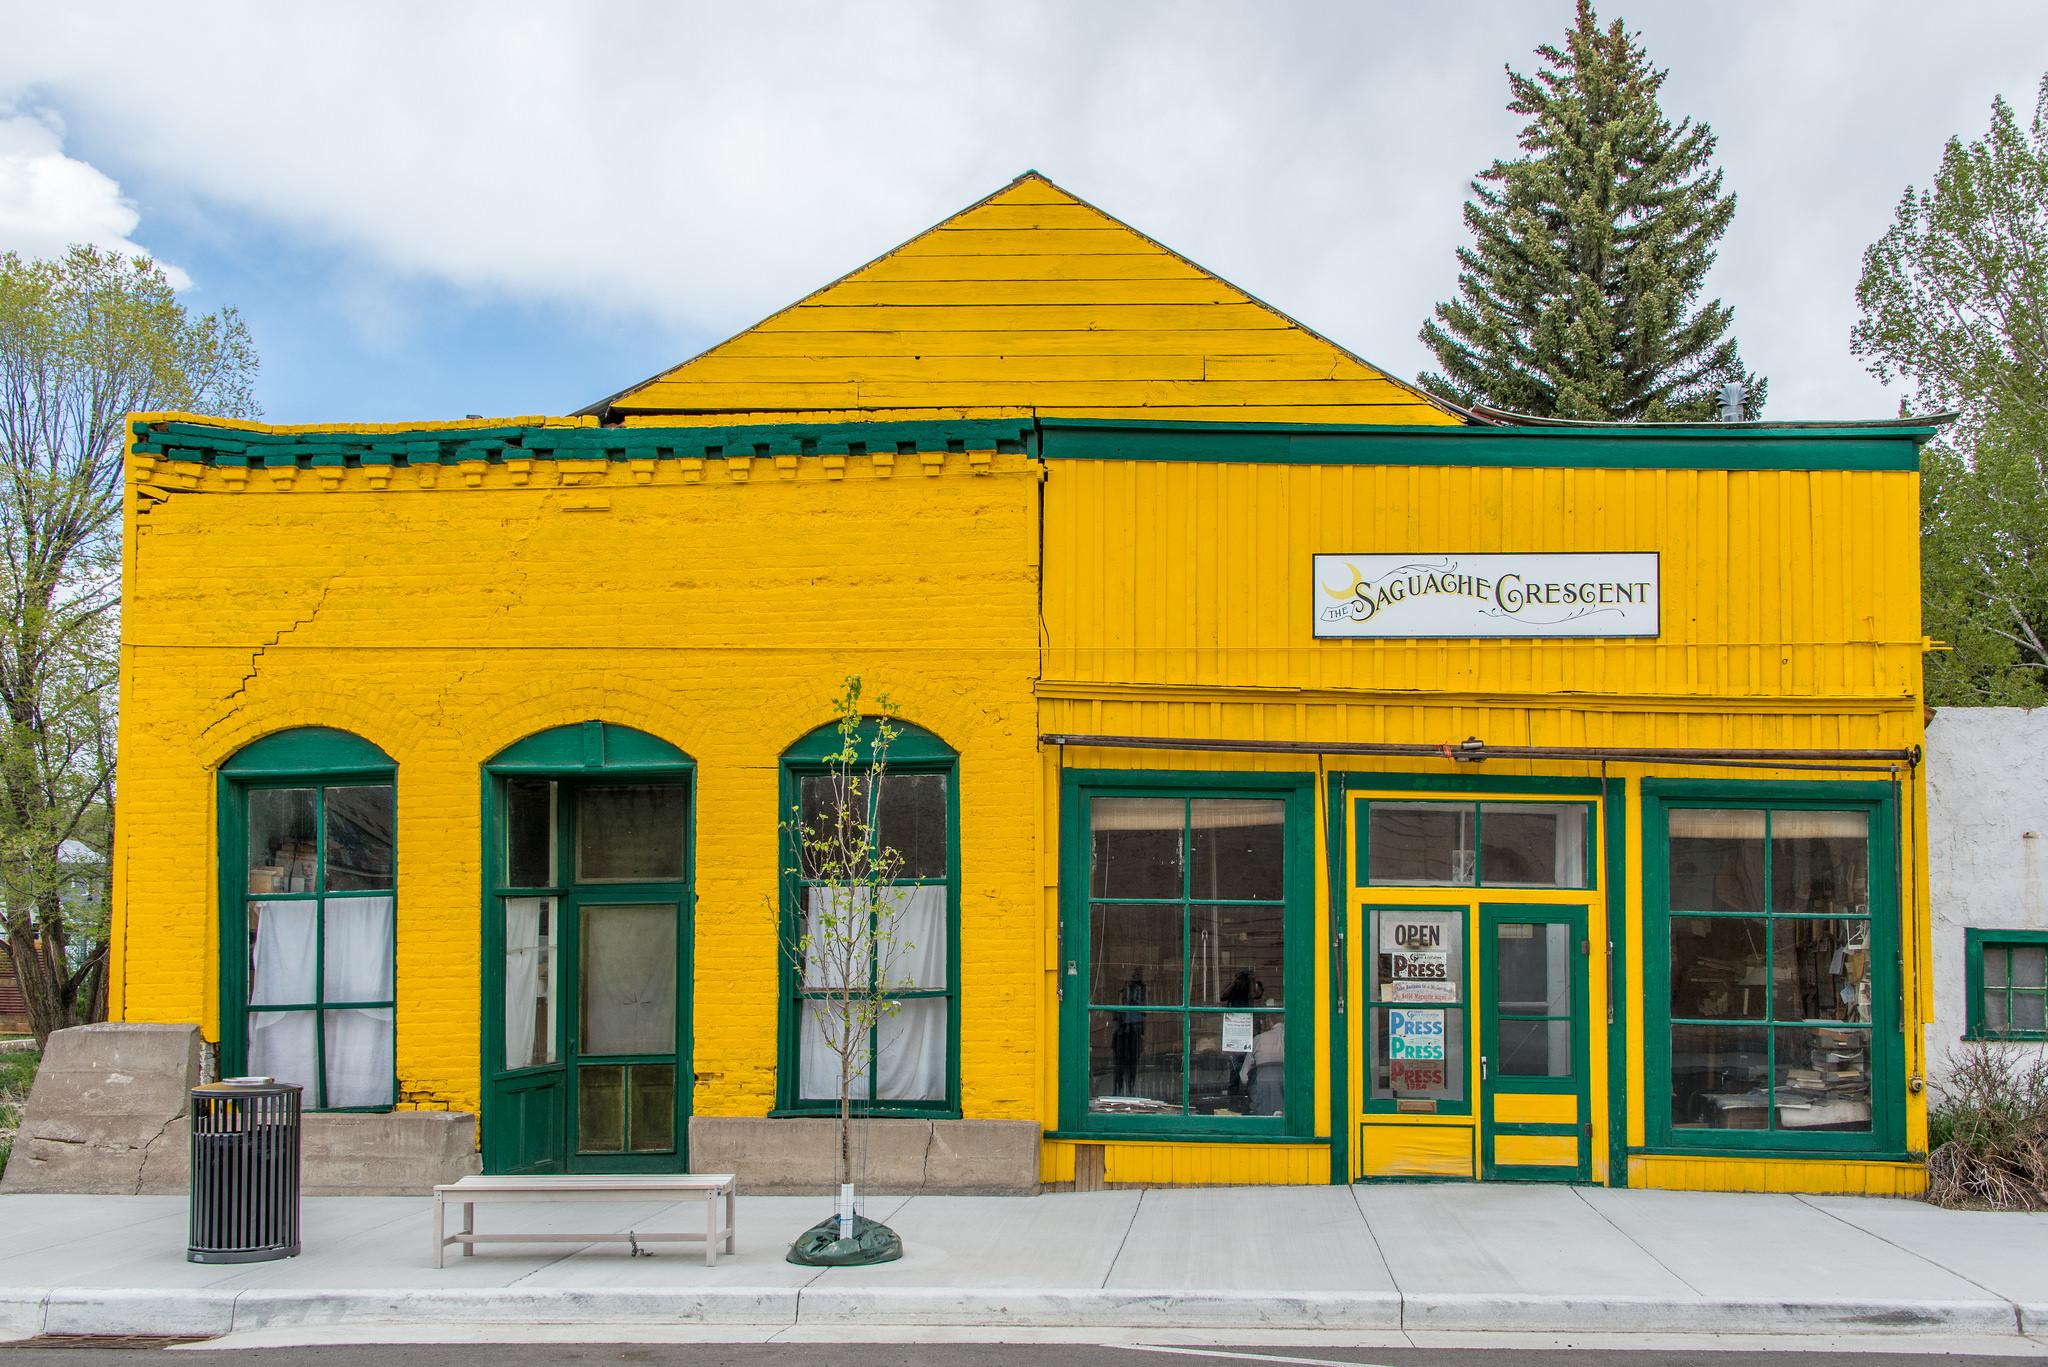 GreatBigStory.com: The Saguache Crescent